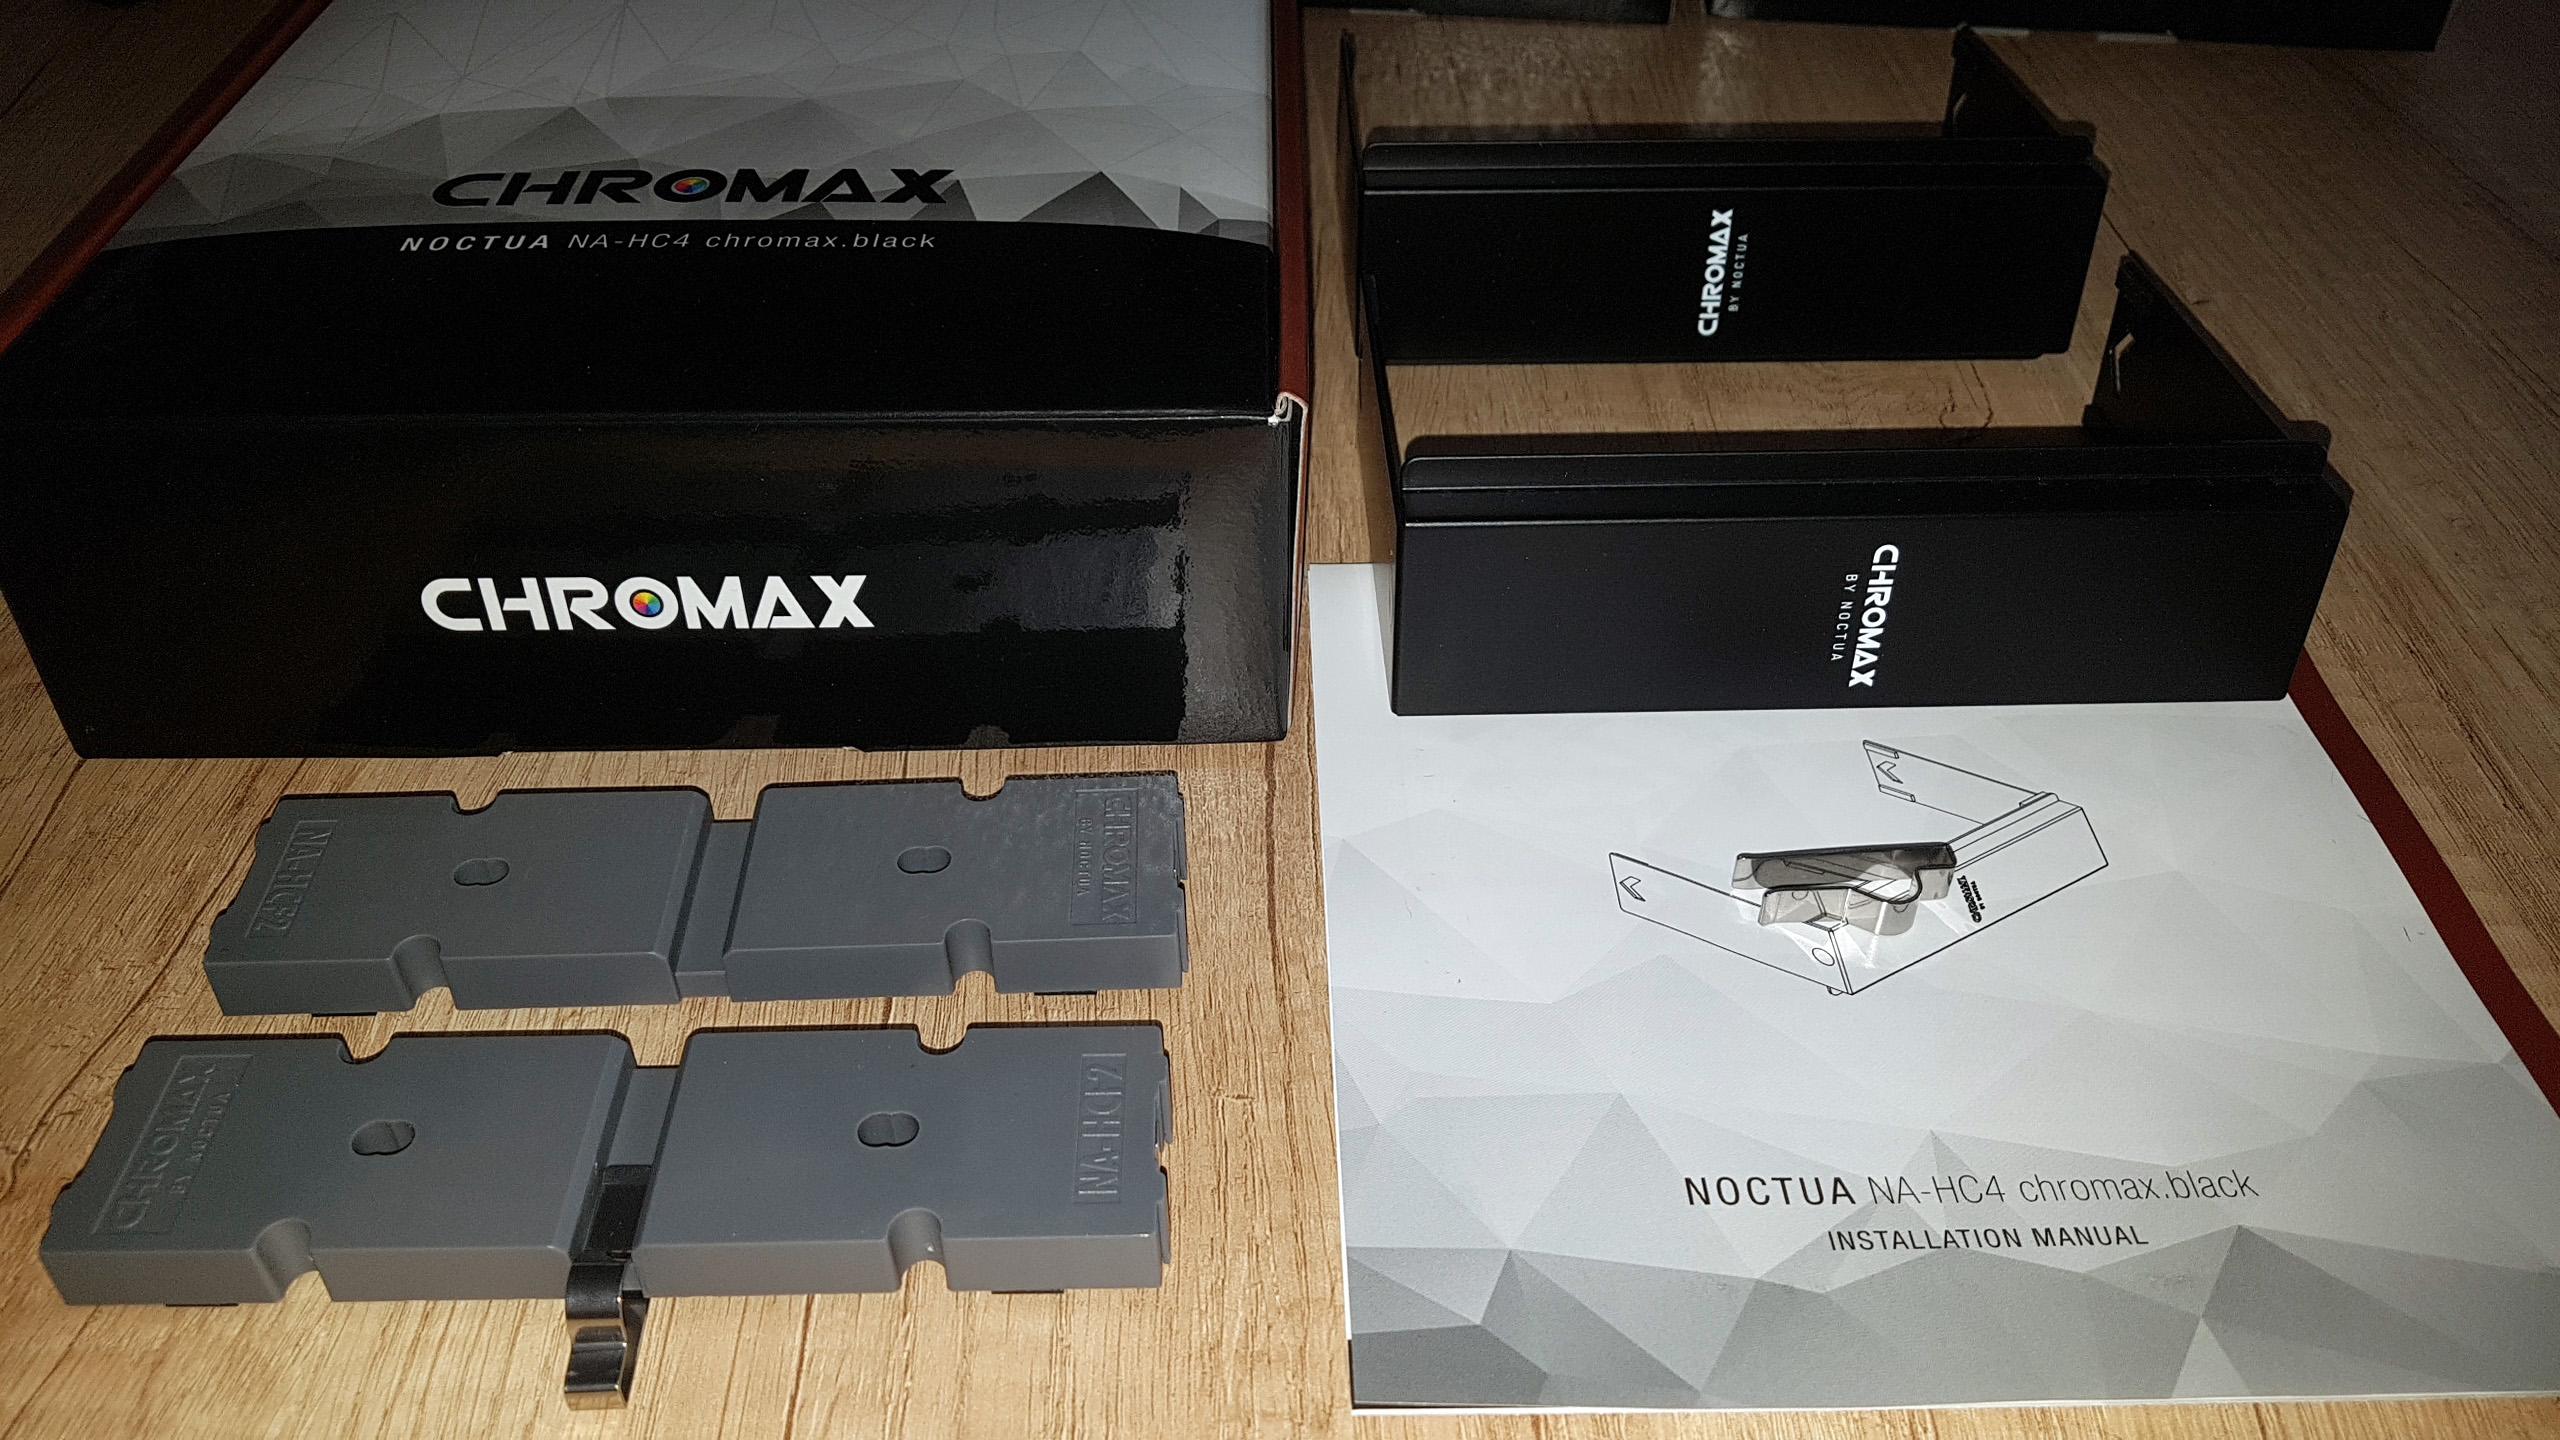 Noctua Chromax accessories - Review -